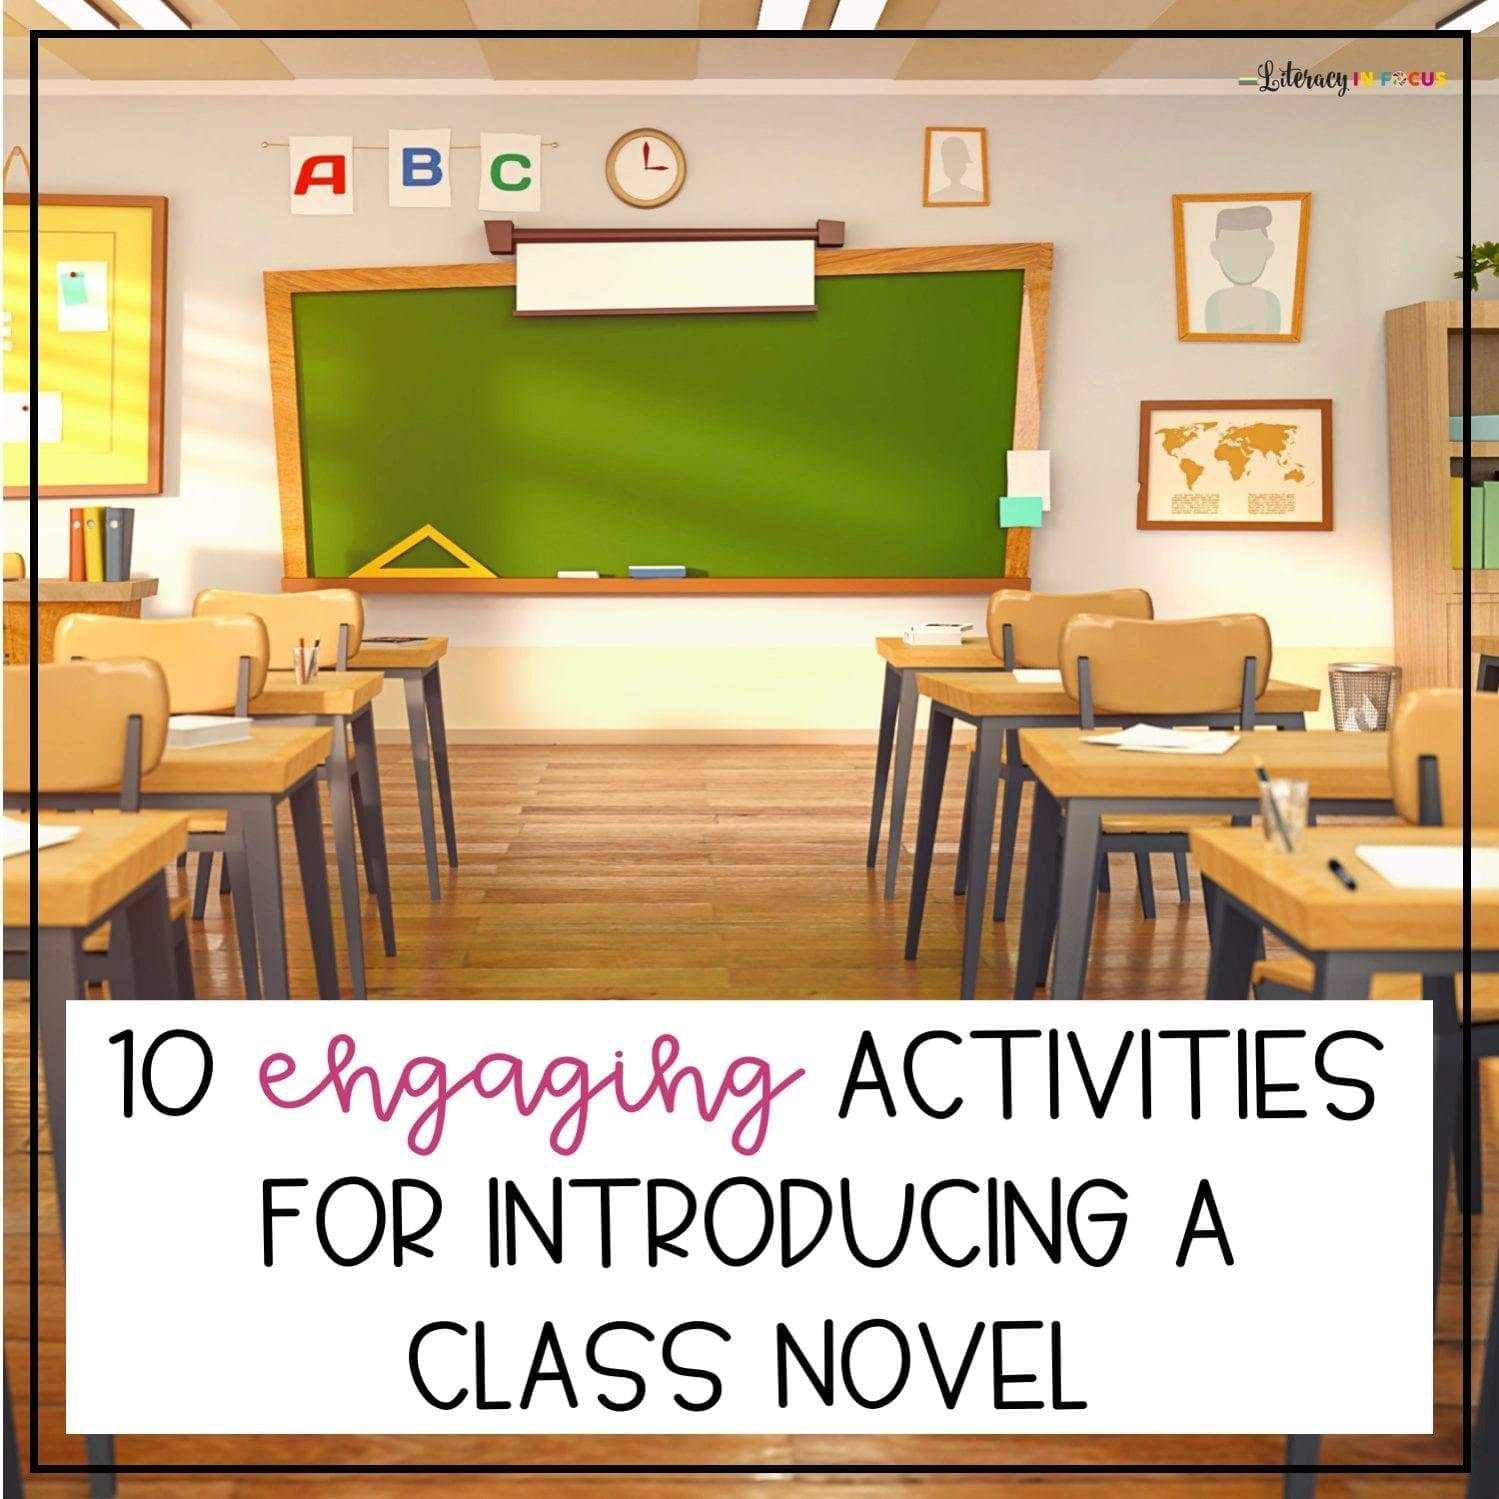 Activities for Introducing a Class Novel